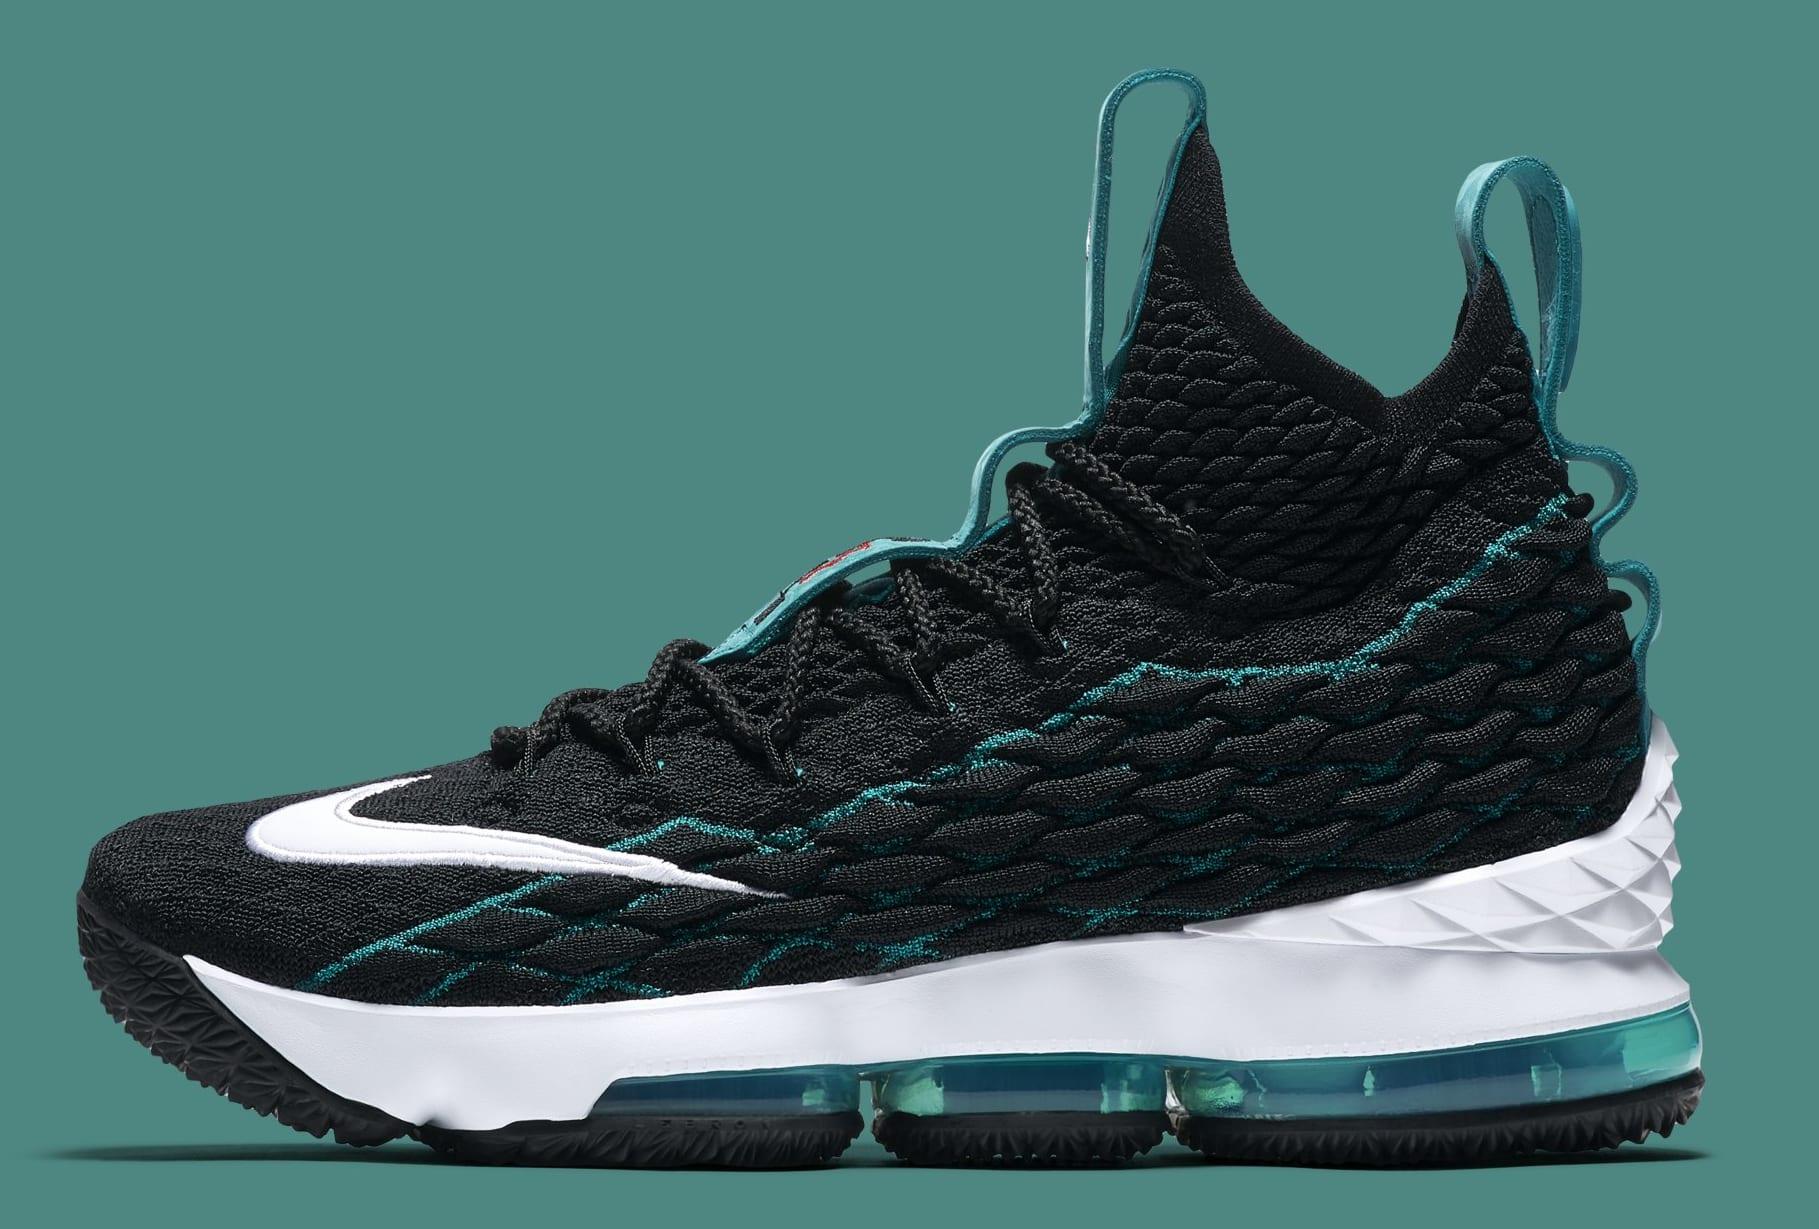 97bbbc17dab7 ... pretty cheap Image via Nike Nike LeBron 15 Griffey (Lateral) ...